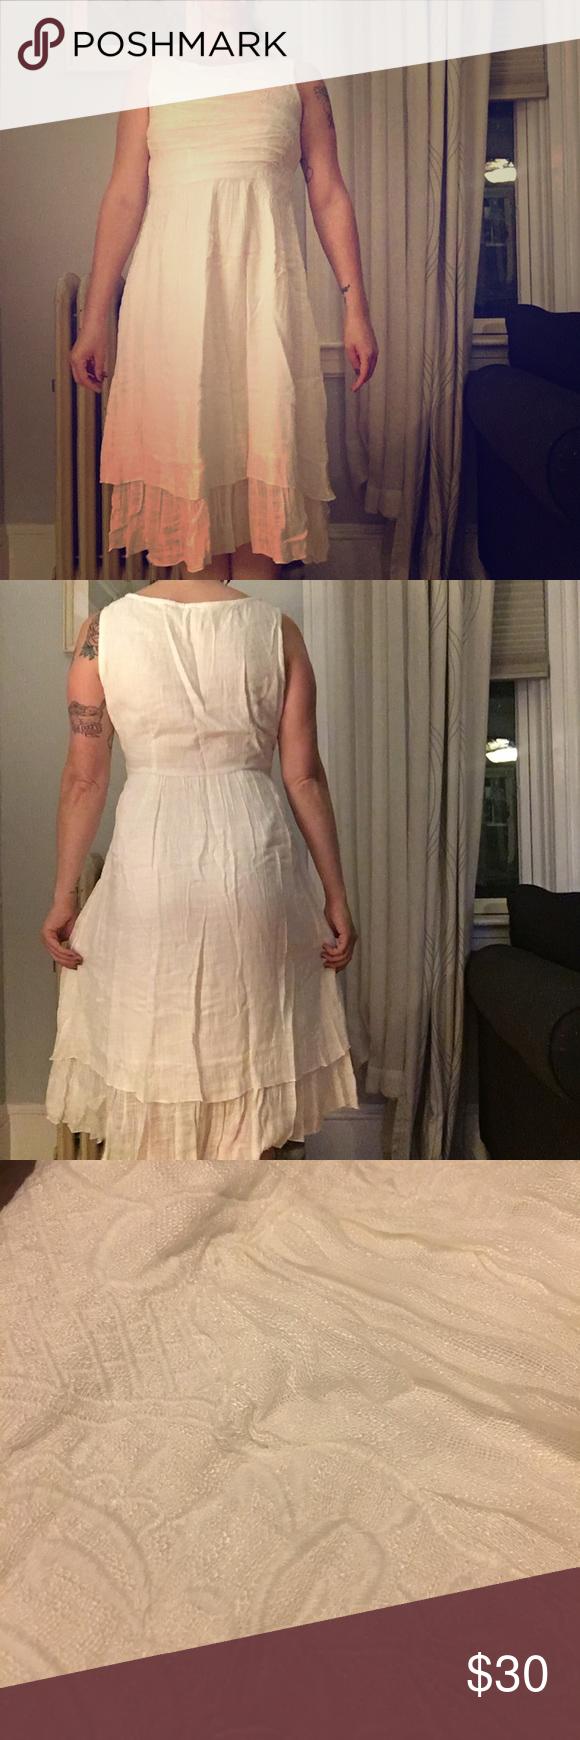 Sundance rayon festival boho wedding dress